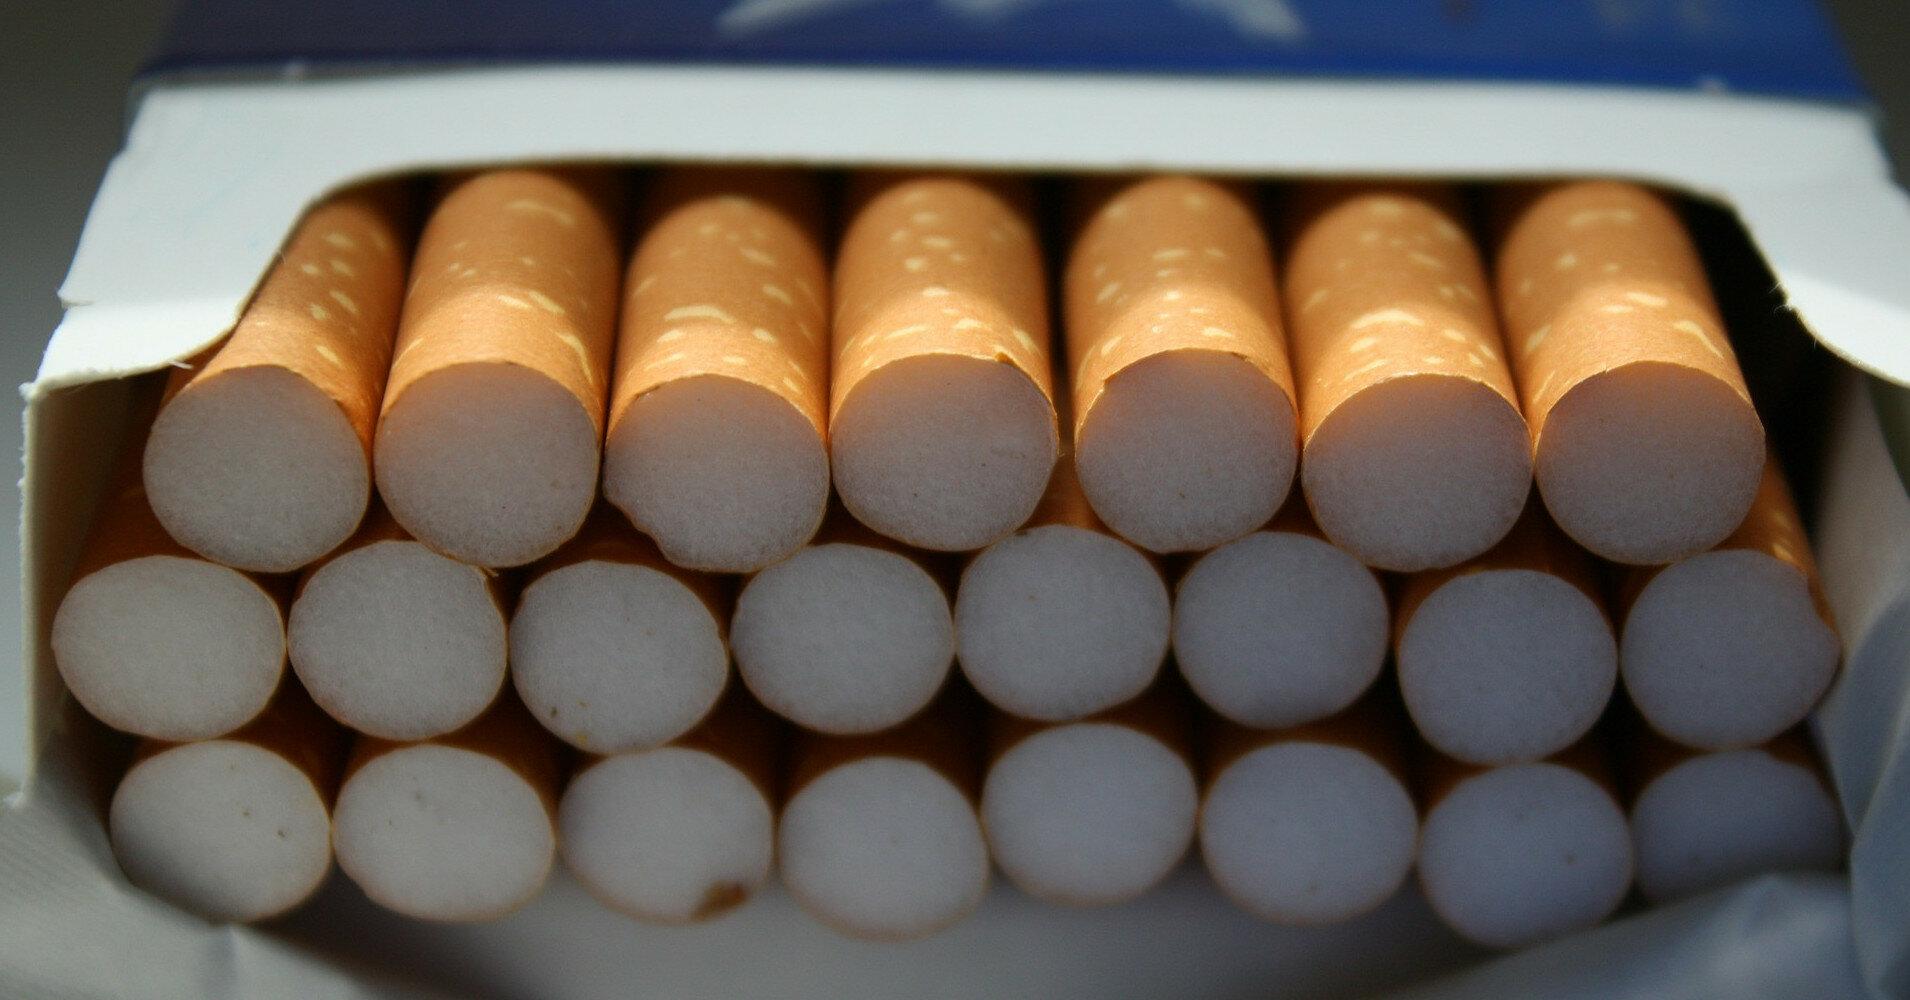 Одна сигарета сокращает жизнь на 5 минут и 30 секунд - исследование